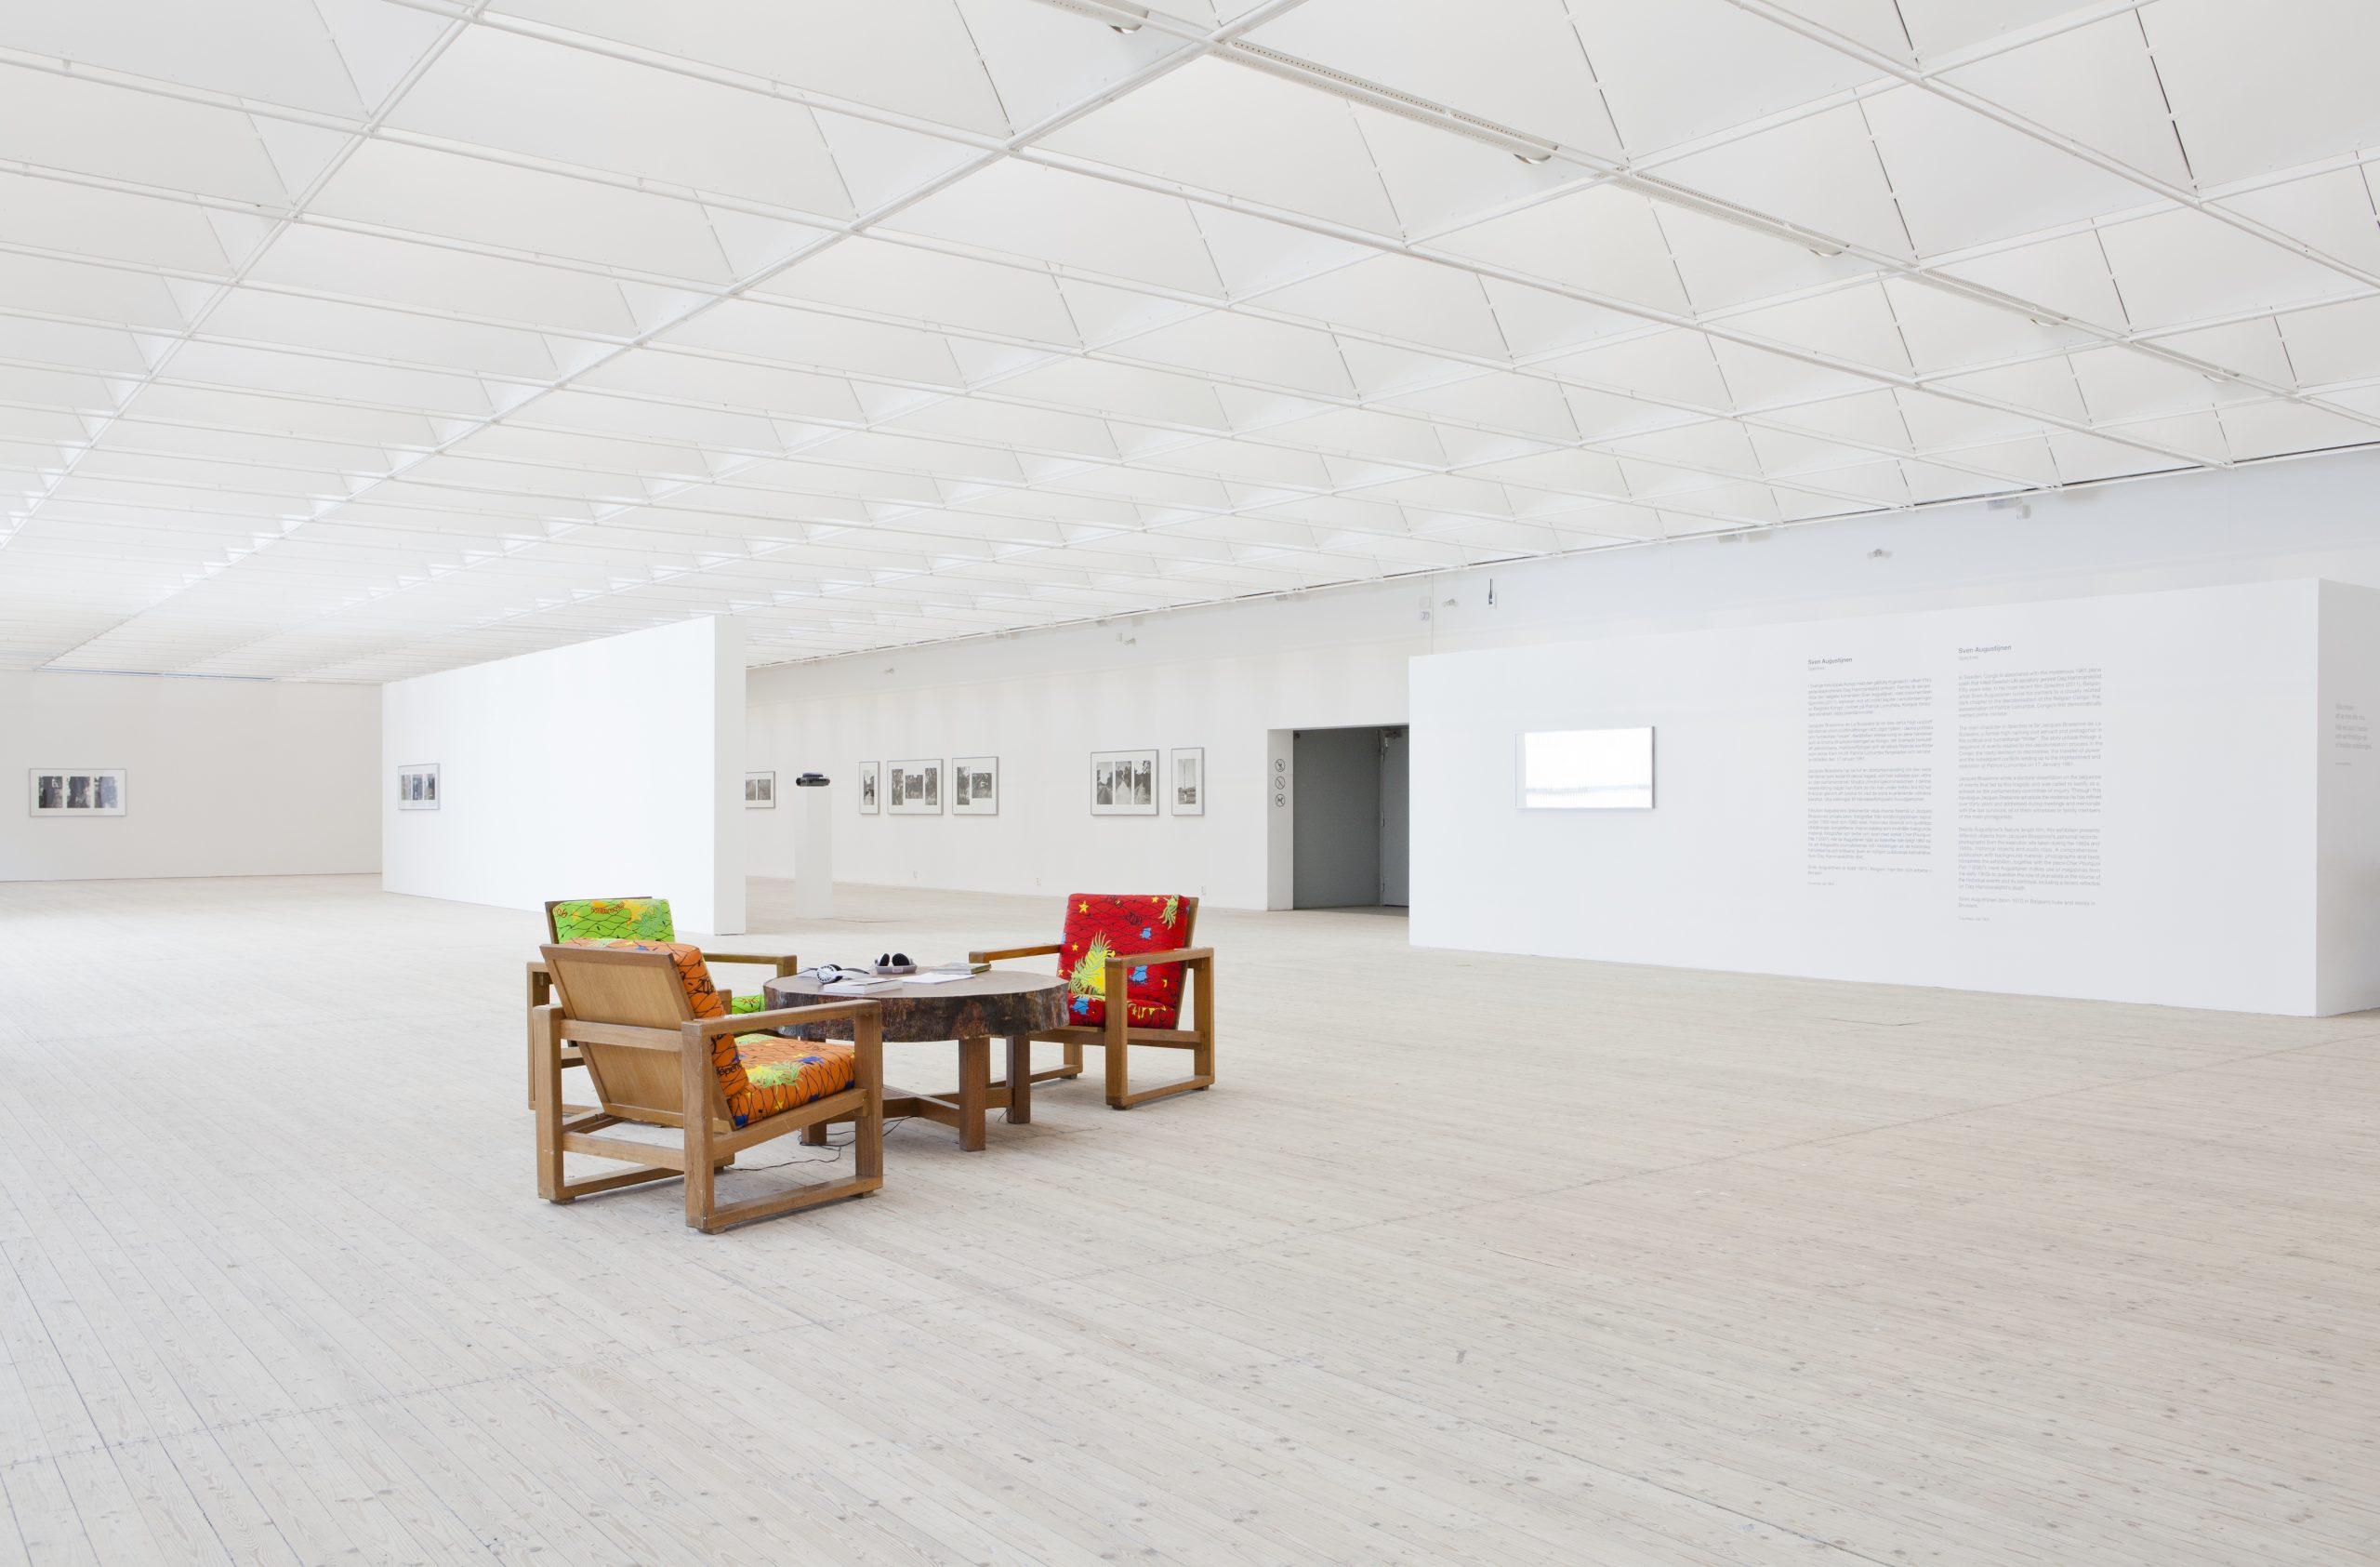 Sven Augustijnen, installation view at Malmo, 2013